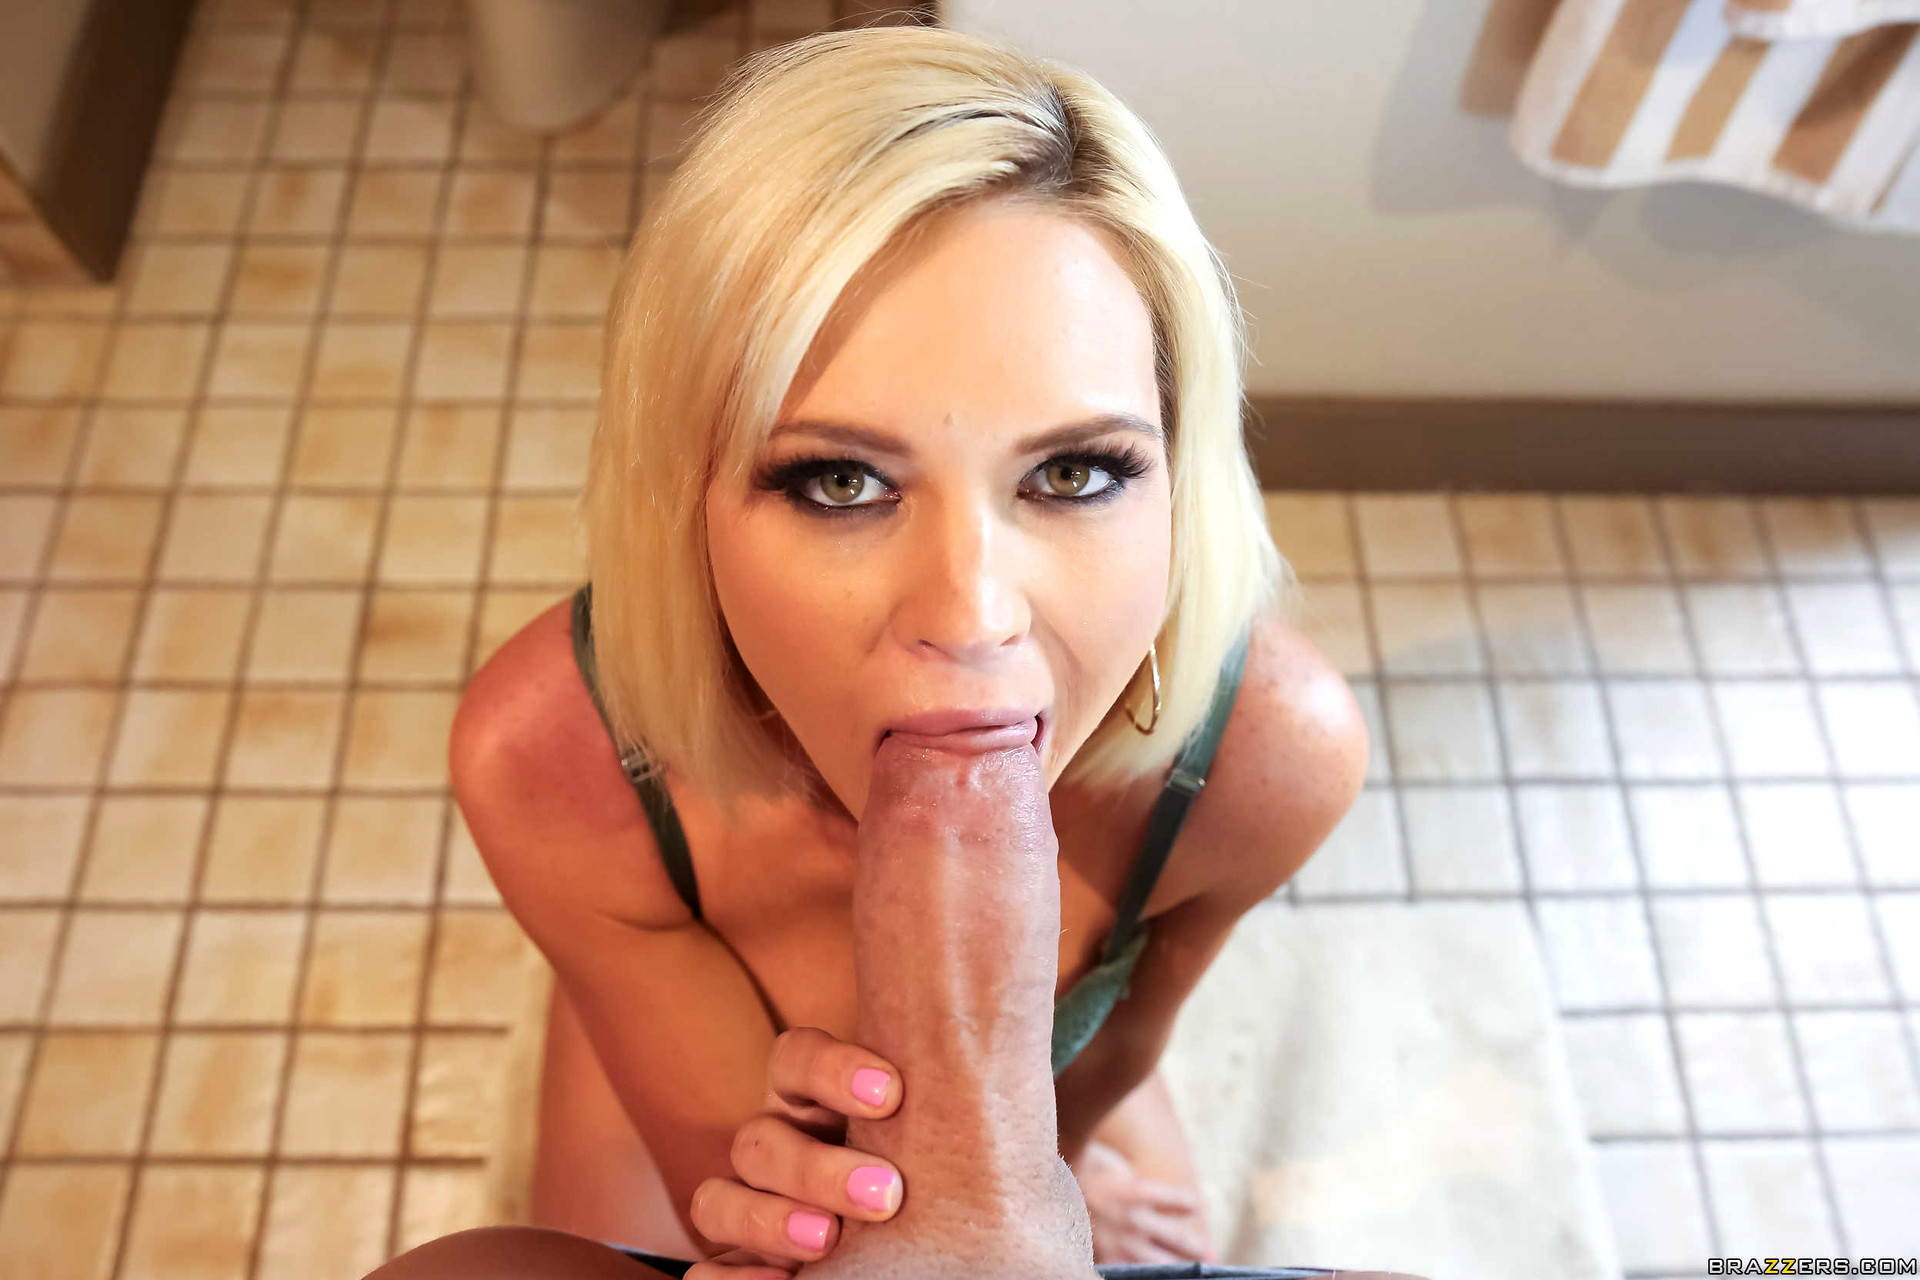 Astrid Star - Vidos Porno Gratuites et Films X YouPorn